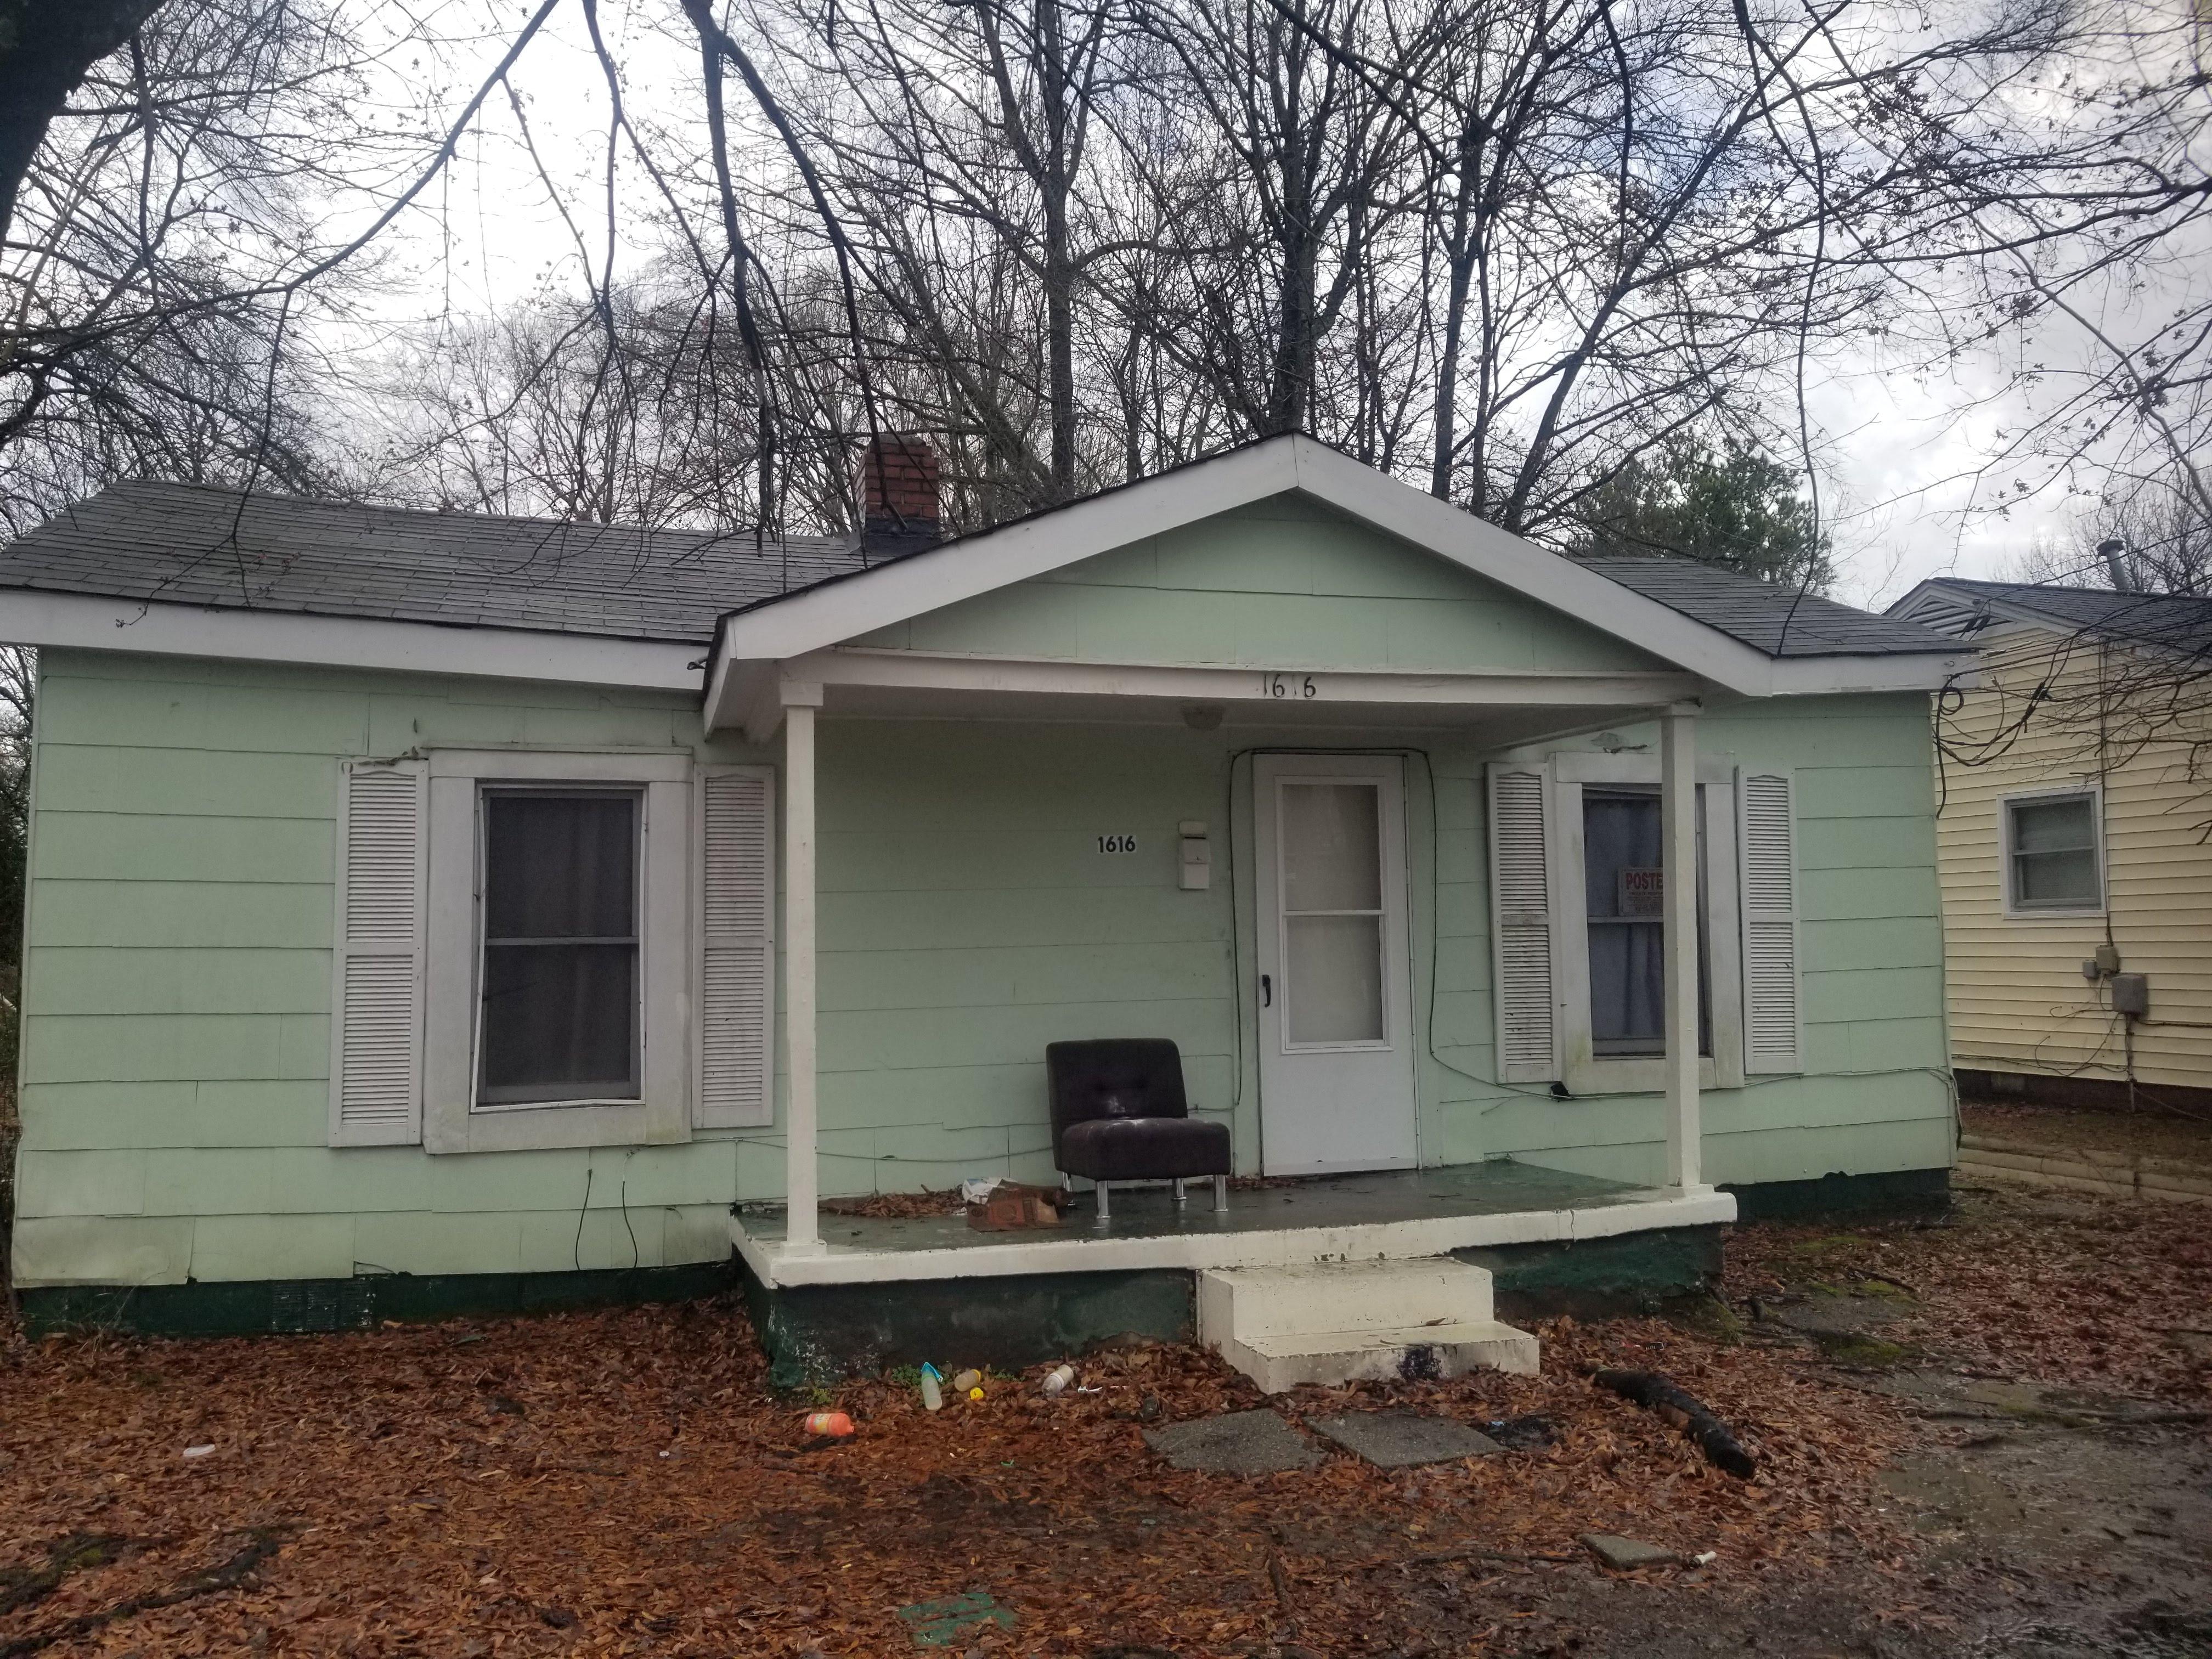 1616 Willow Rd, Greensboro, NC